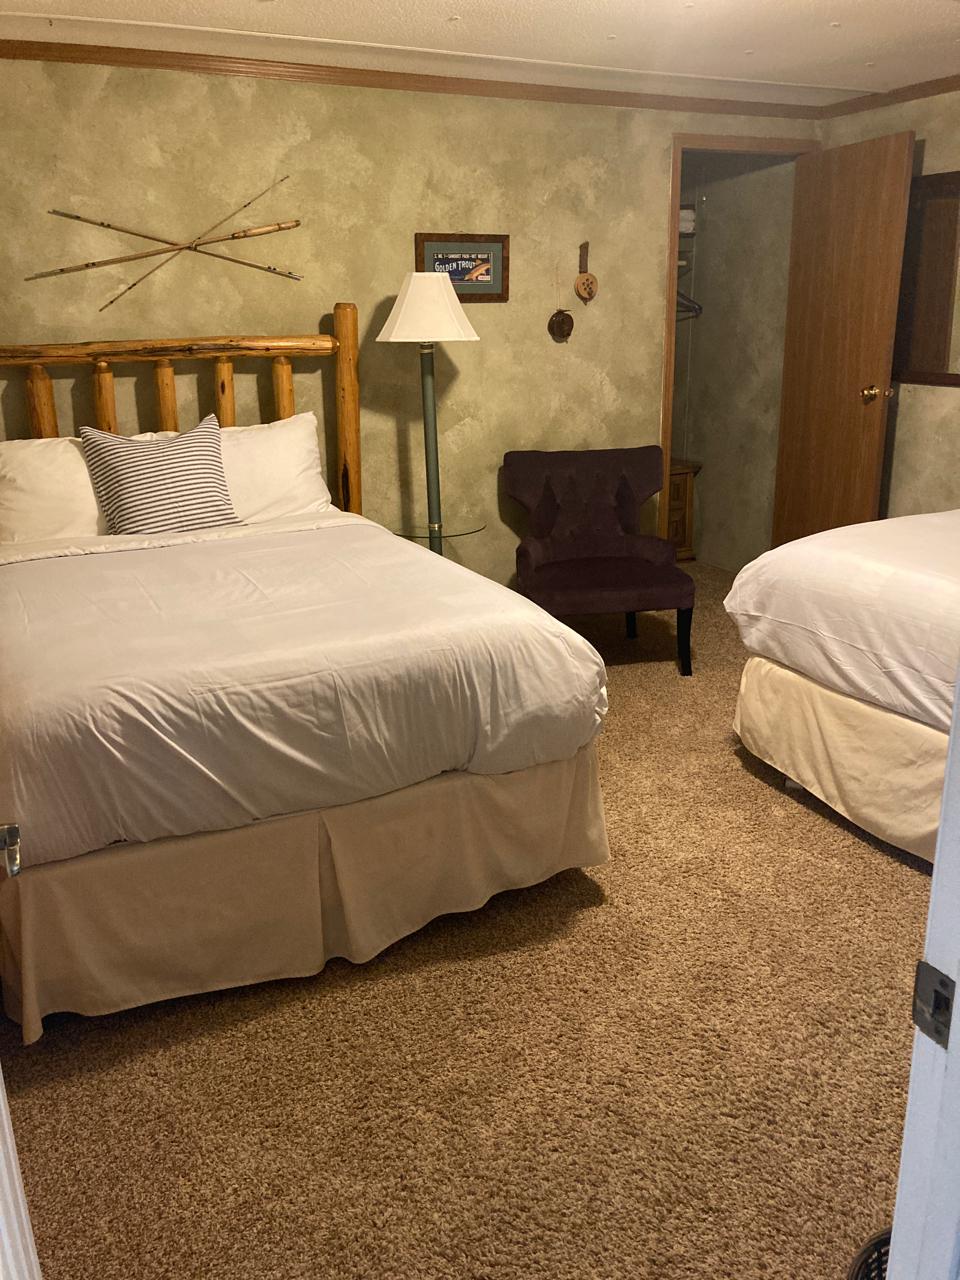 The Angler Room: 2 Full Beds